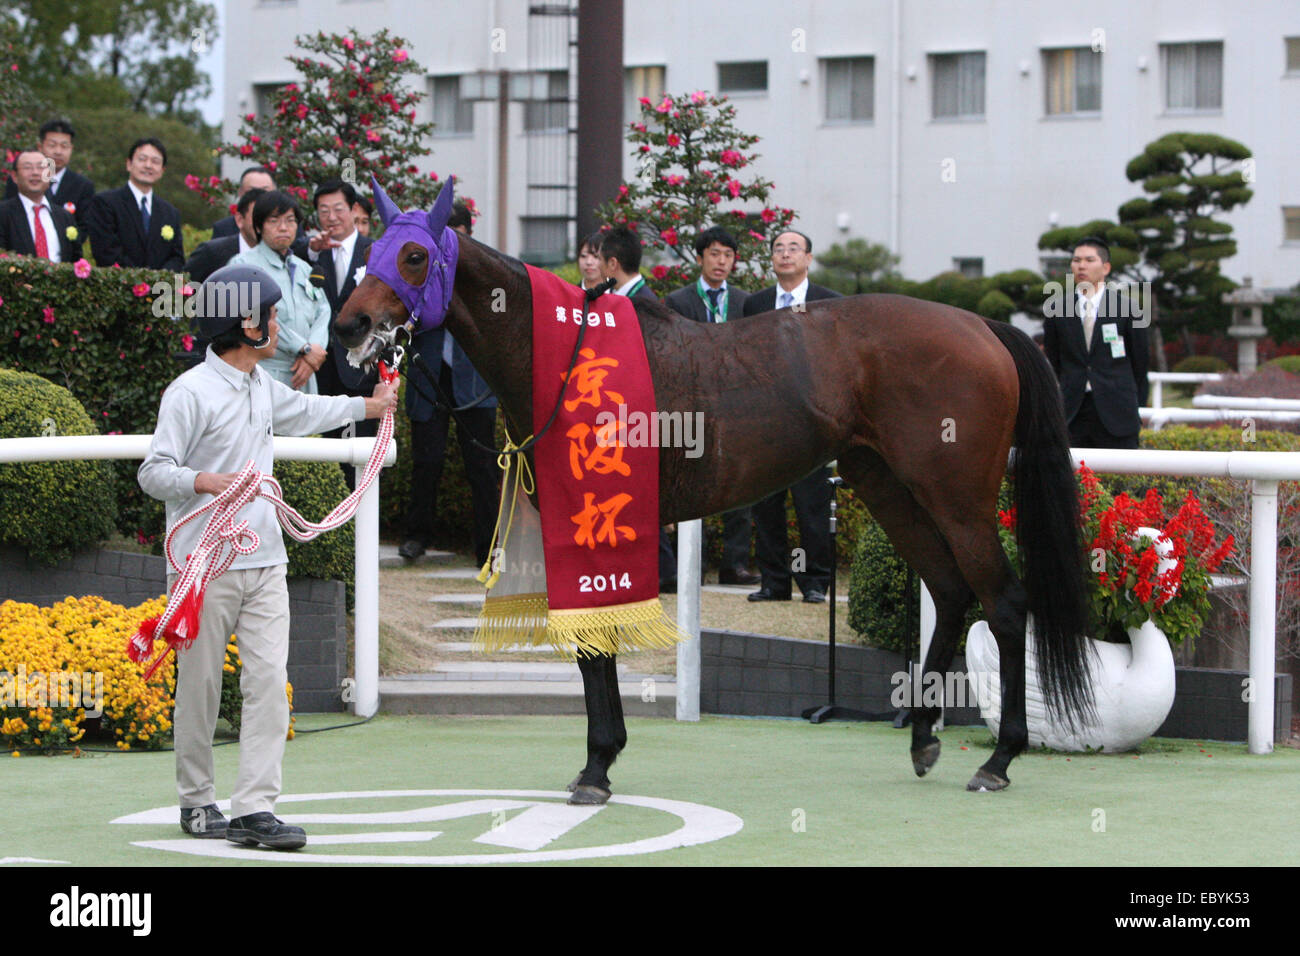 Kyoto, Japan. 30th Nov, 2014. Am Ball Bleiben Horse Racing : Am Ball Bleiben is led through the paddock after winning Stock Photo